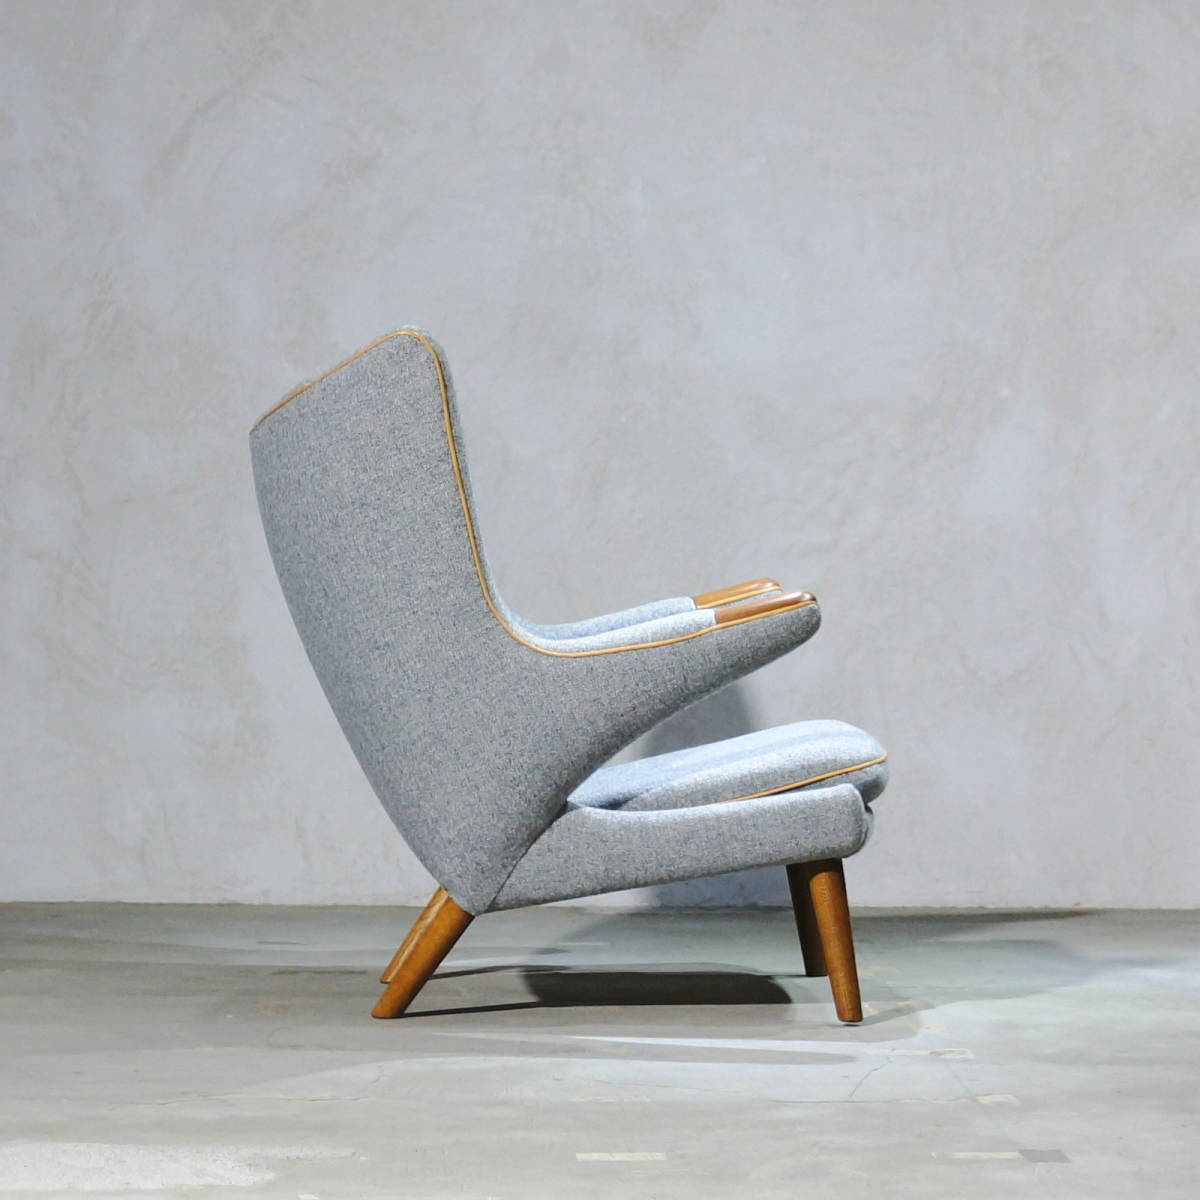 Hans J. Wegner ウェグナー AP-19 Bear Chair ベアチェア Teak & Oak チークオーク ※フィンユール モーエンセン_画像5